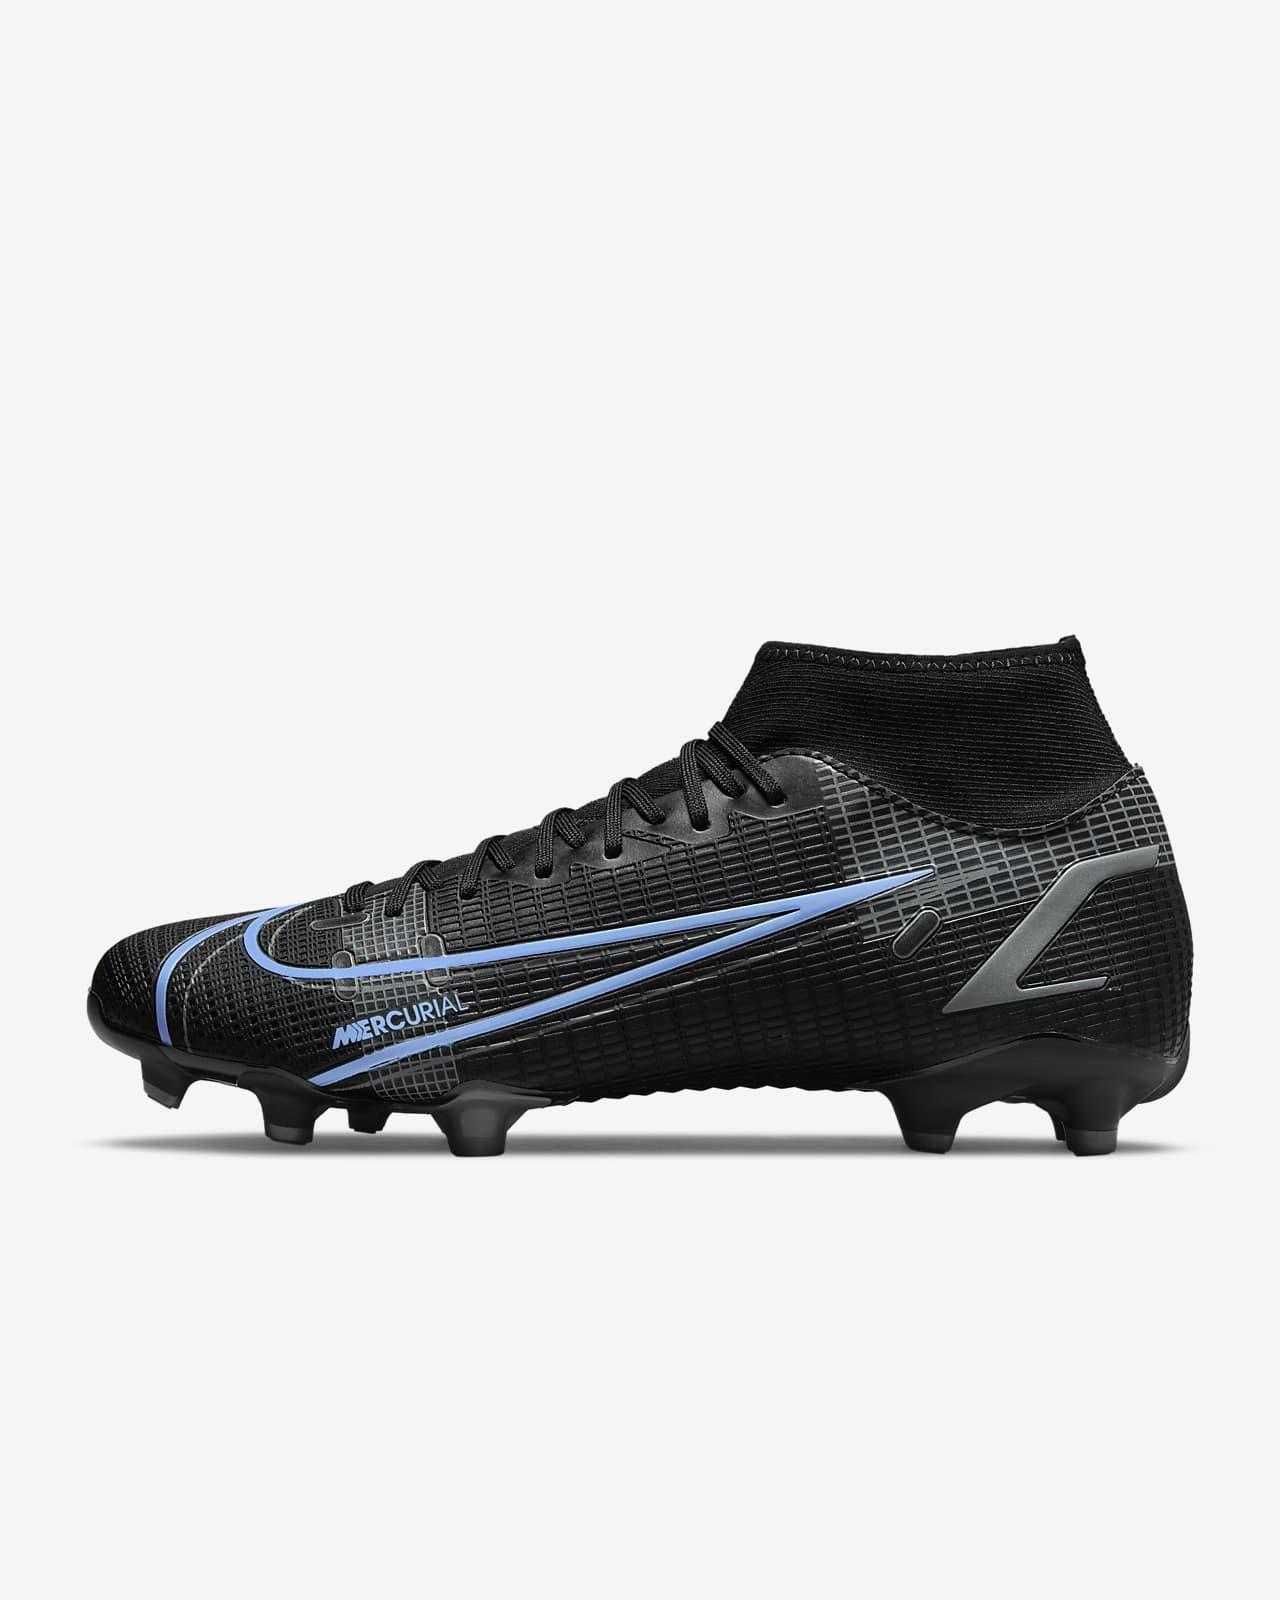 Calzado de fútbol para múltiples superficies Nike Mercurial Superfly 8 Academy MG